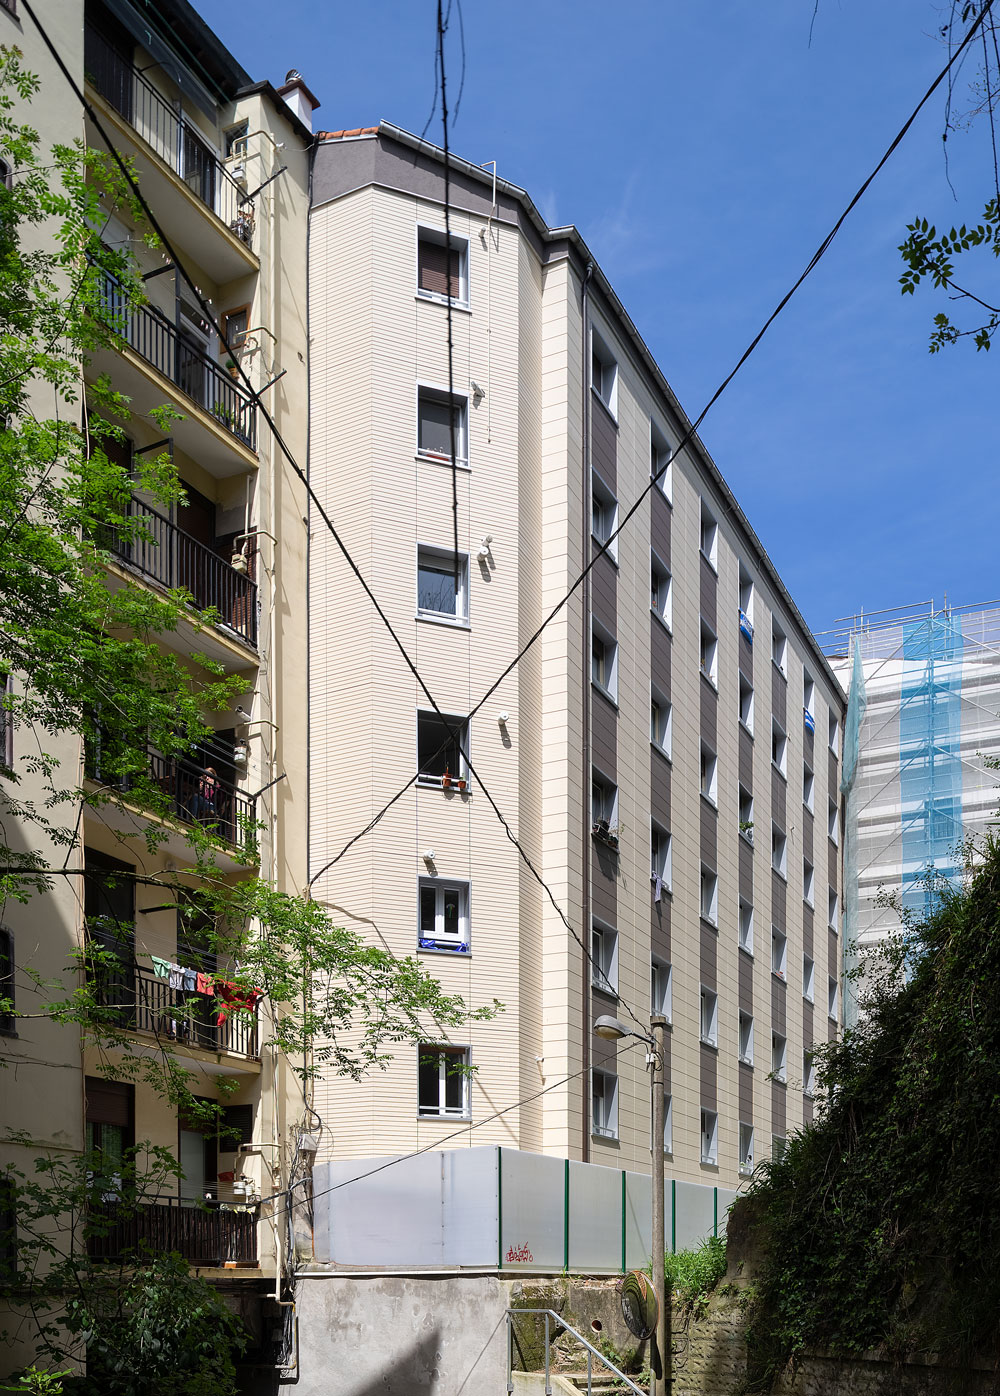 Rehabilitacion-energetica-fachada_ventilada-ceramica_BASA-Arquitectura-San-Sebastian-Donosti_4_b